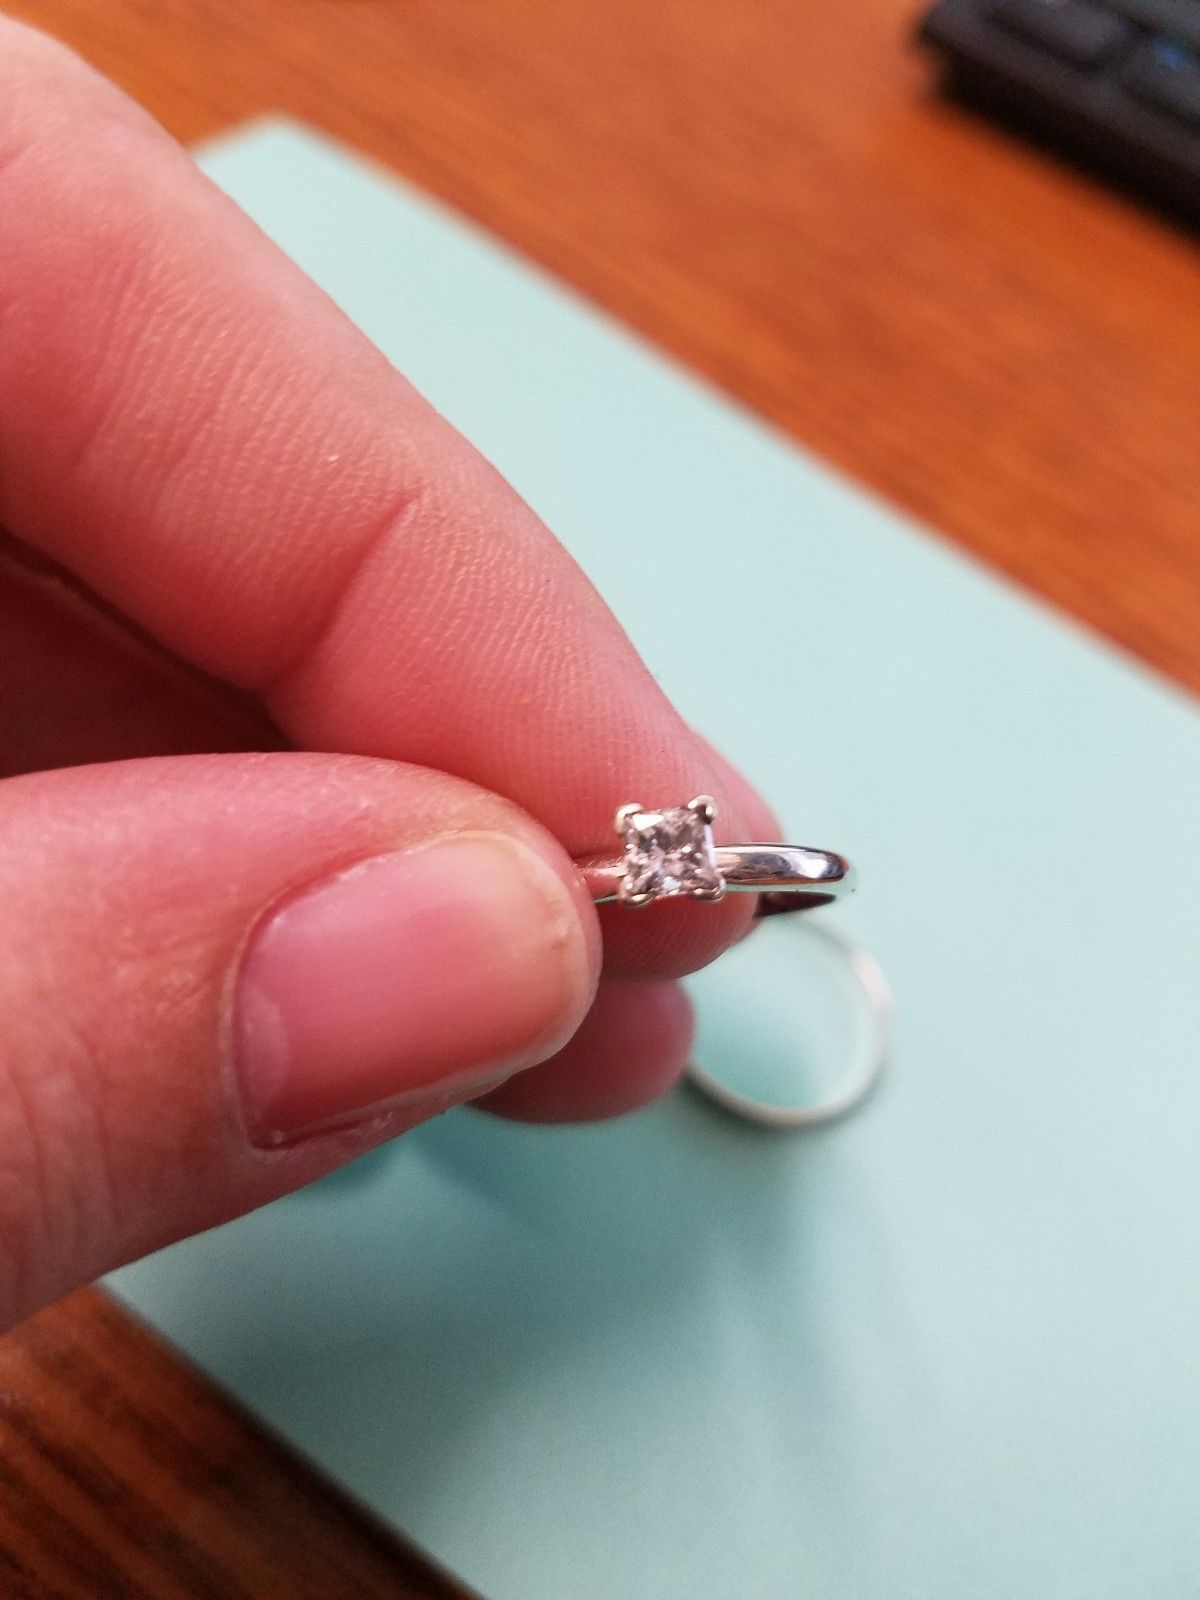 White gold 1 3 carat diamond engagement ring and wedding band size